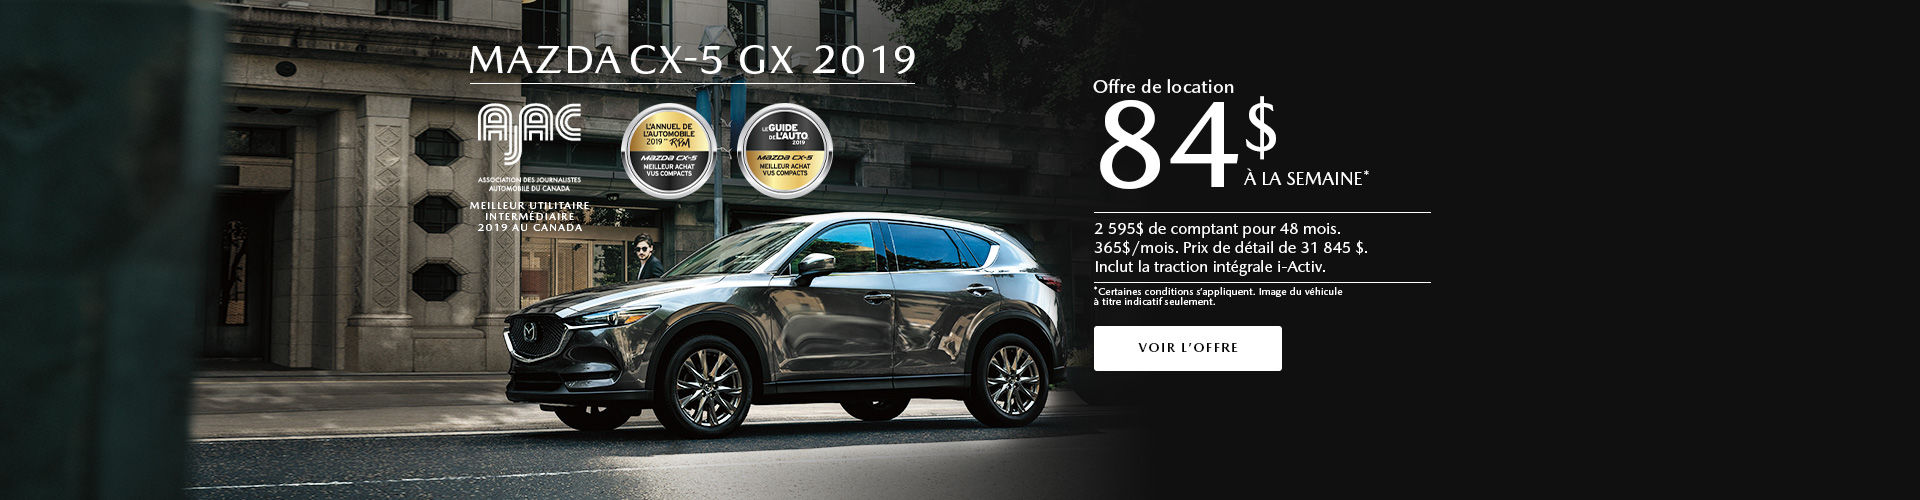 Mazda CX-5 Promotion juillet